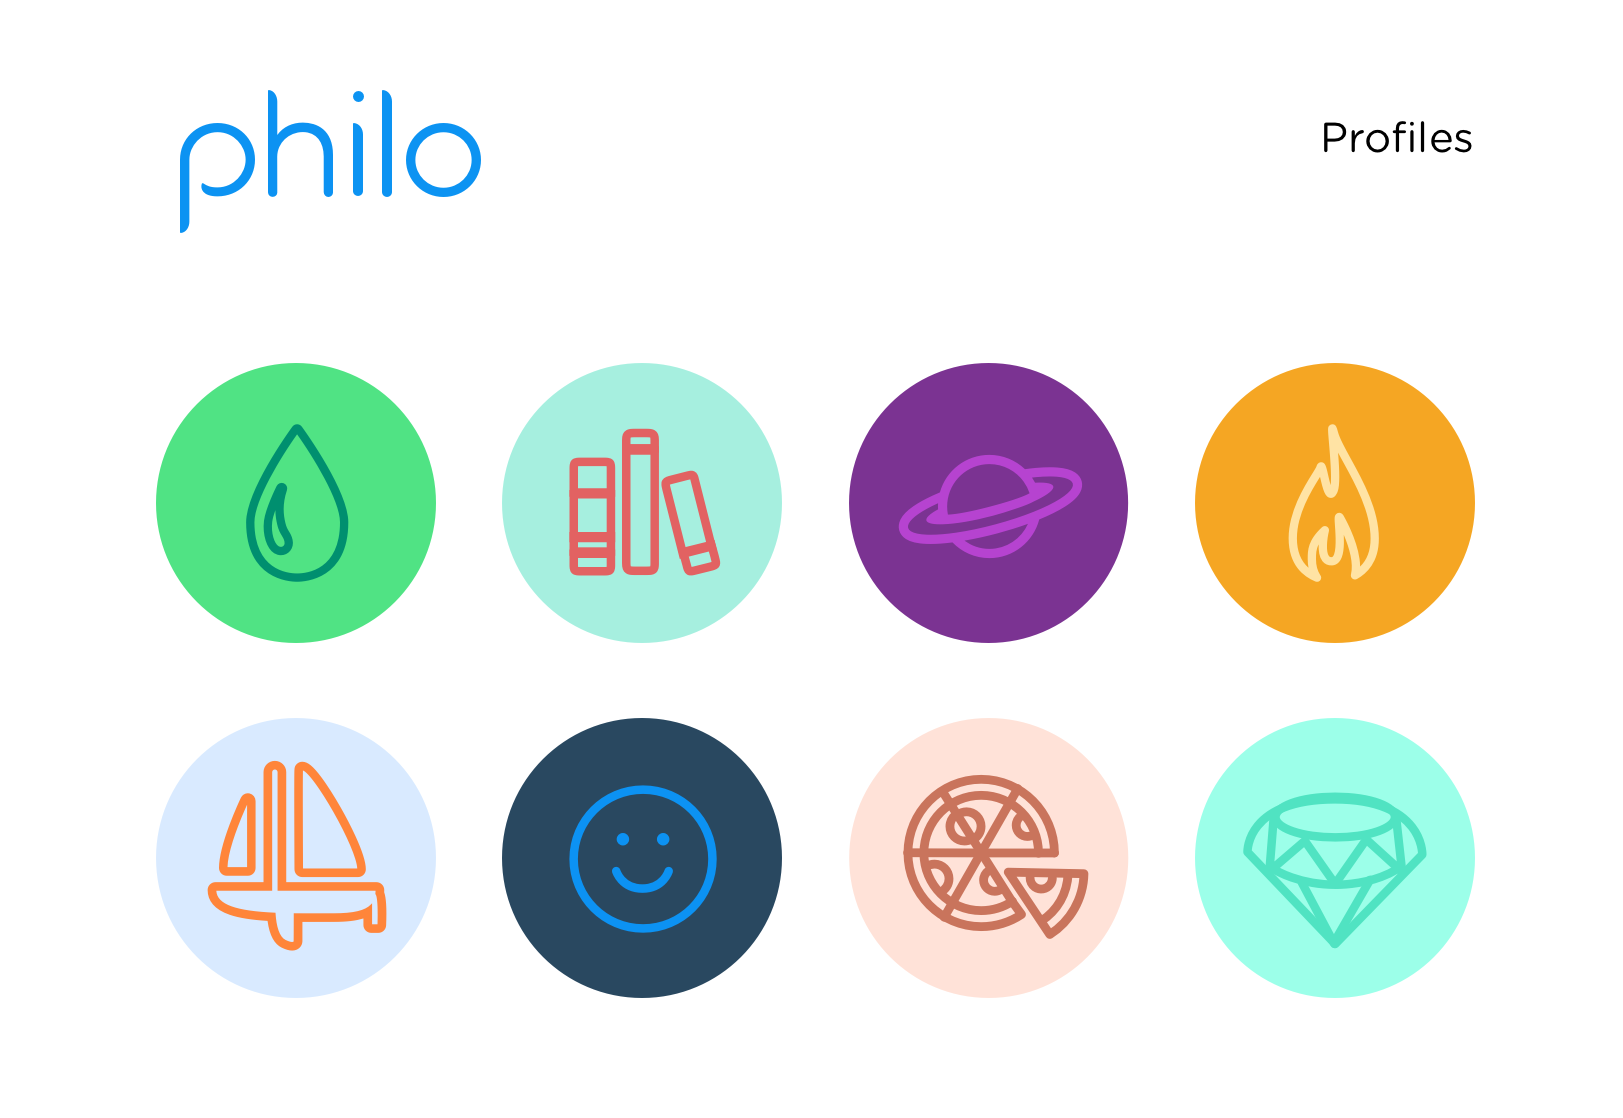 'Philo profile logos'